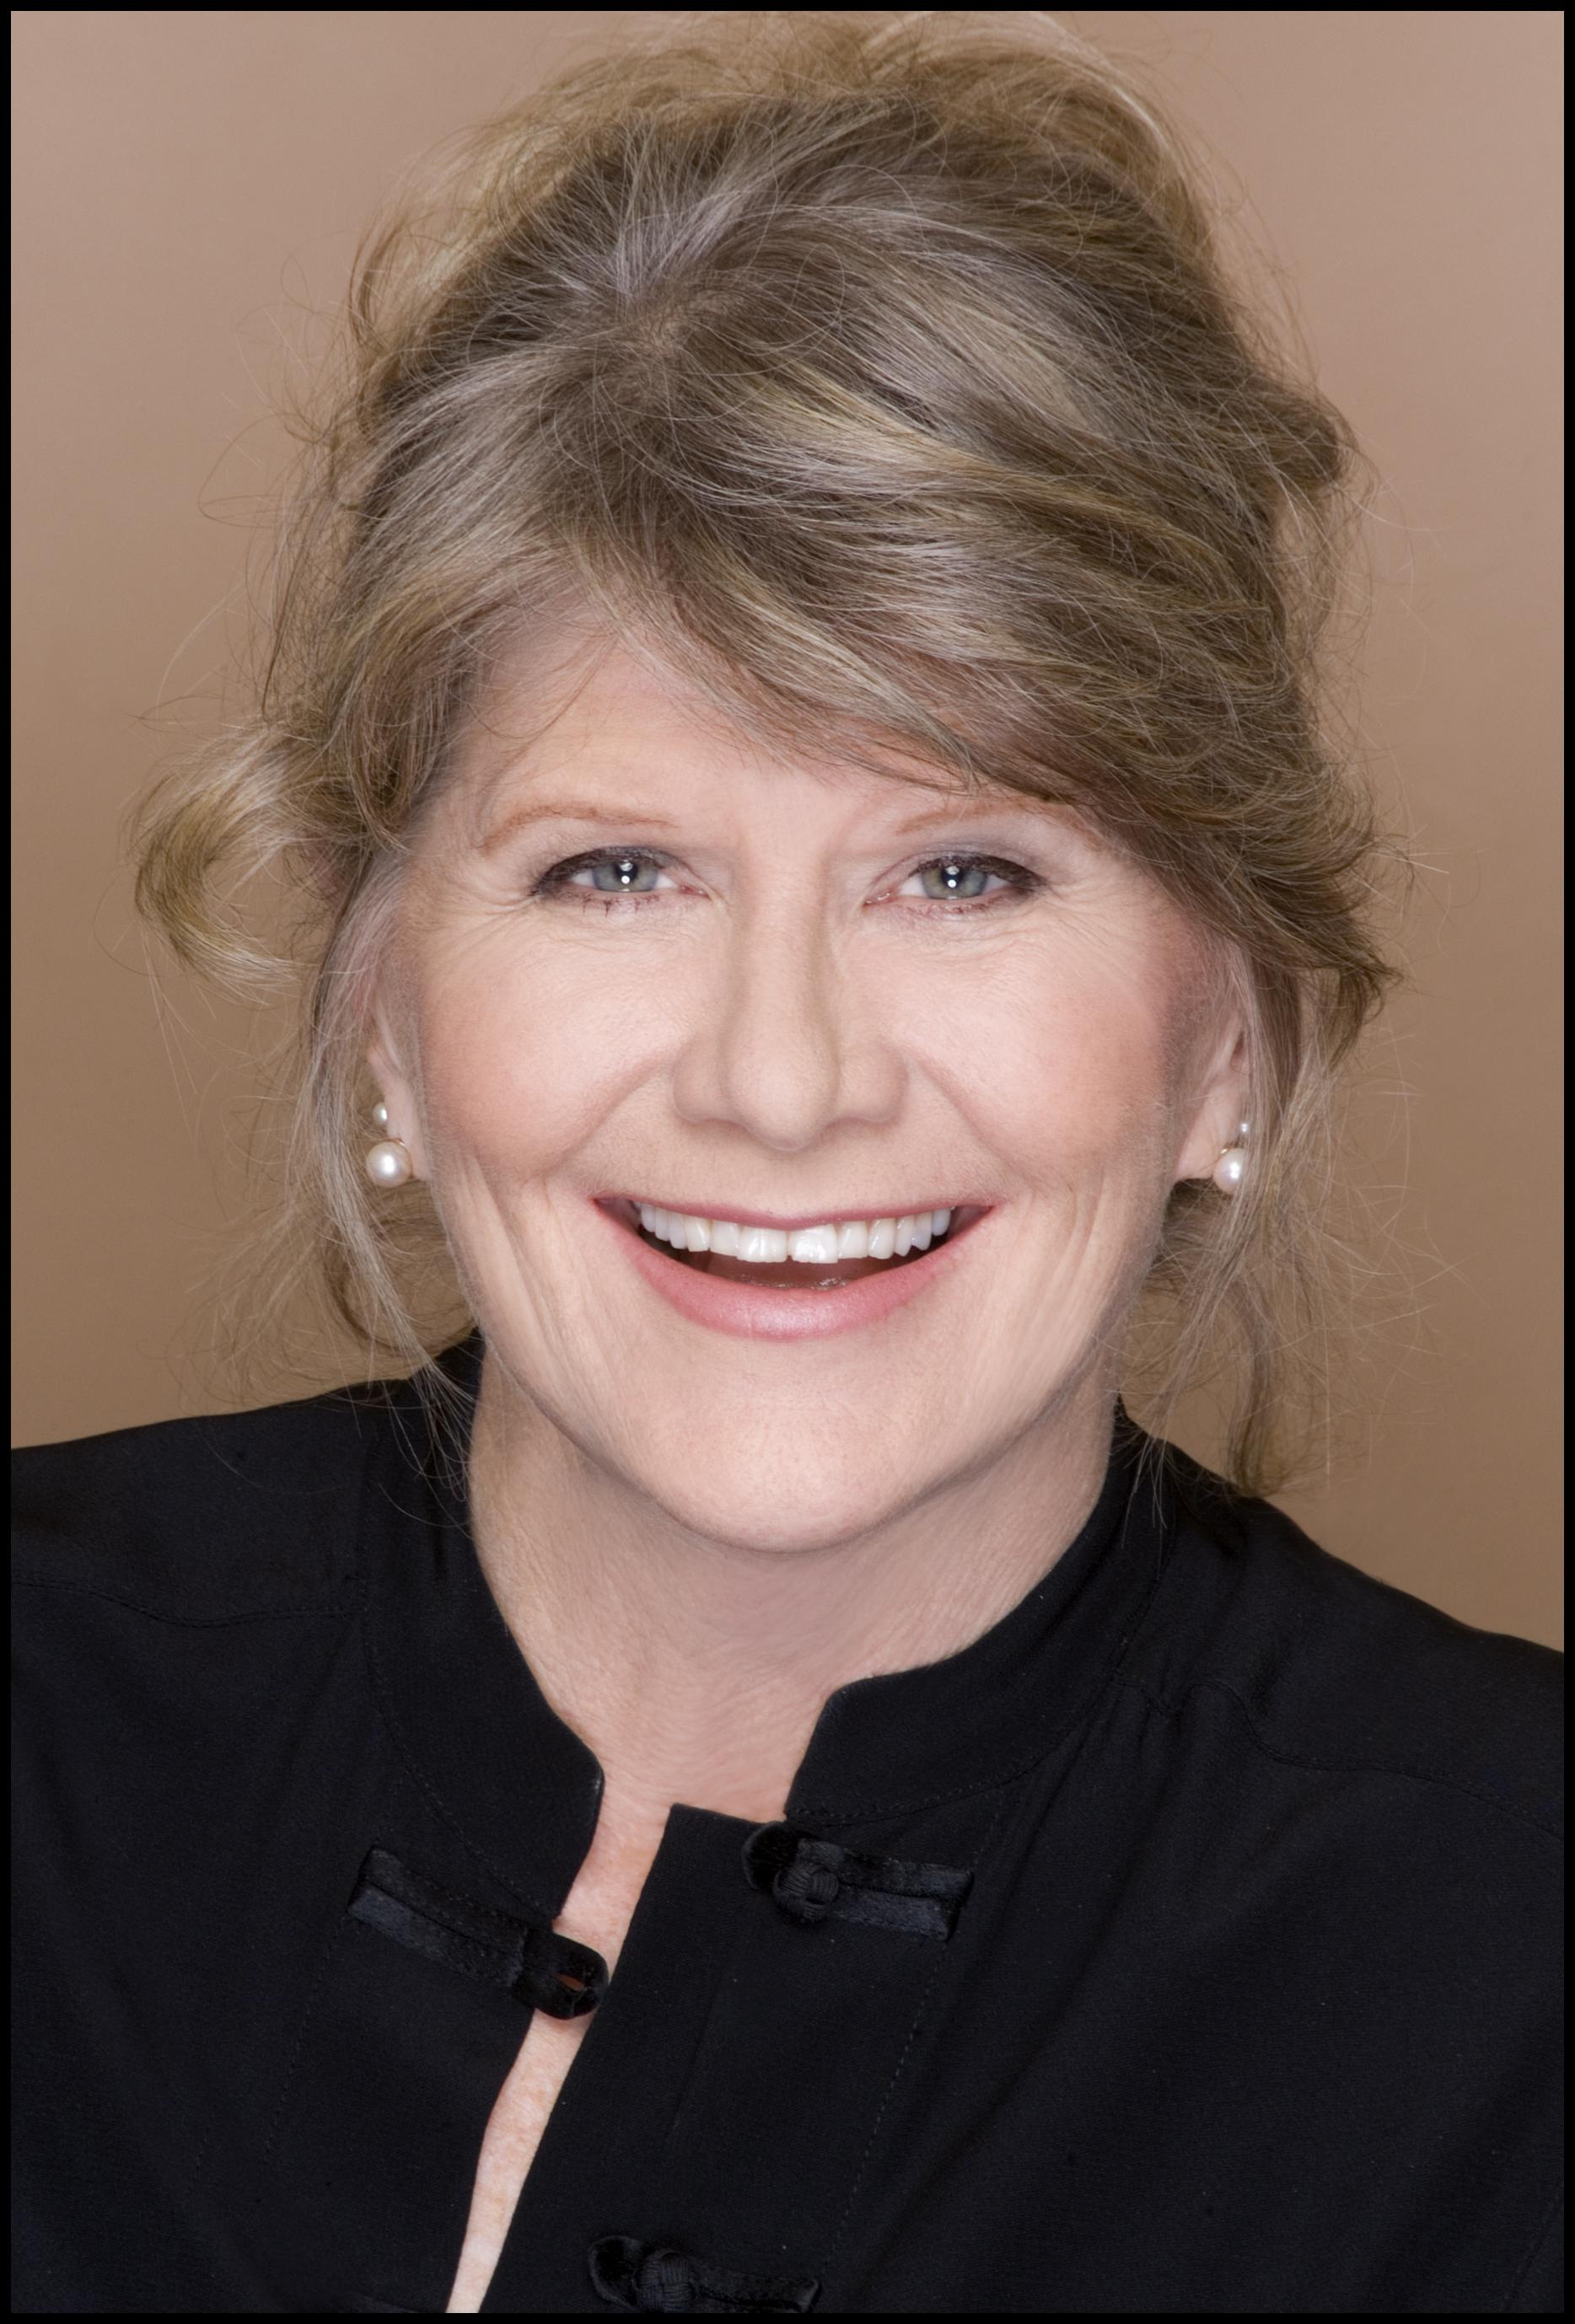 Ellen Parker (actress)